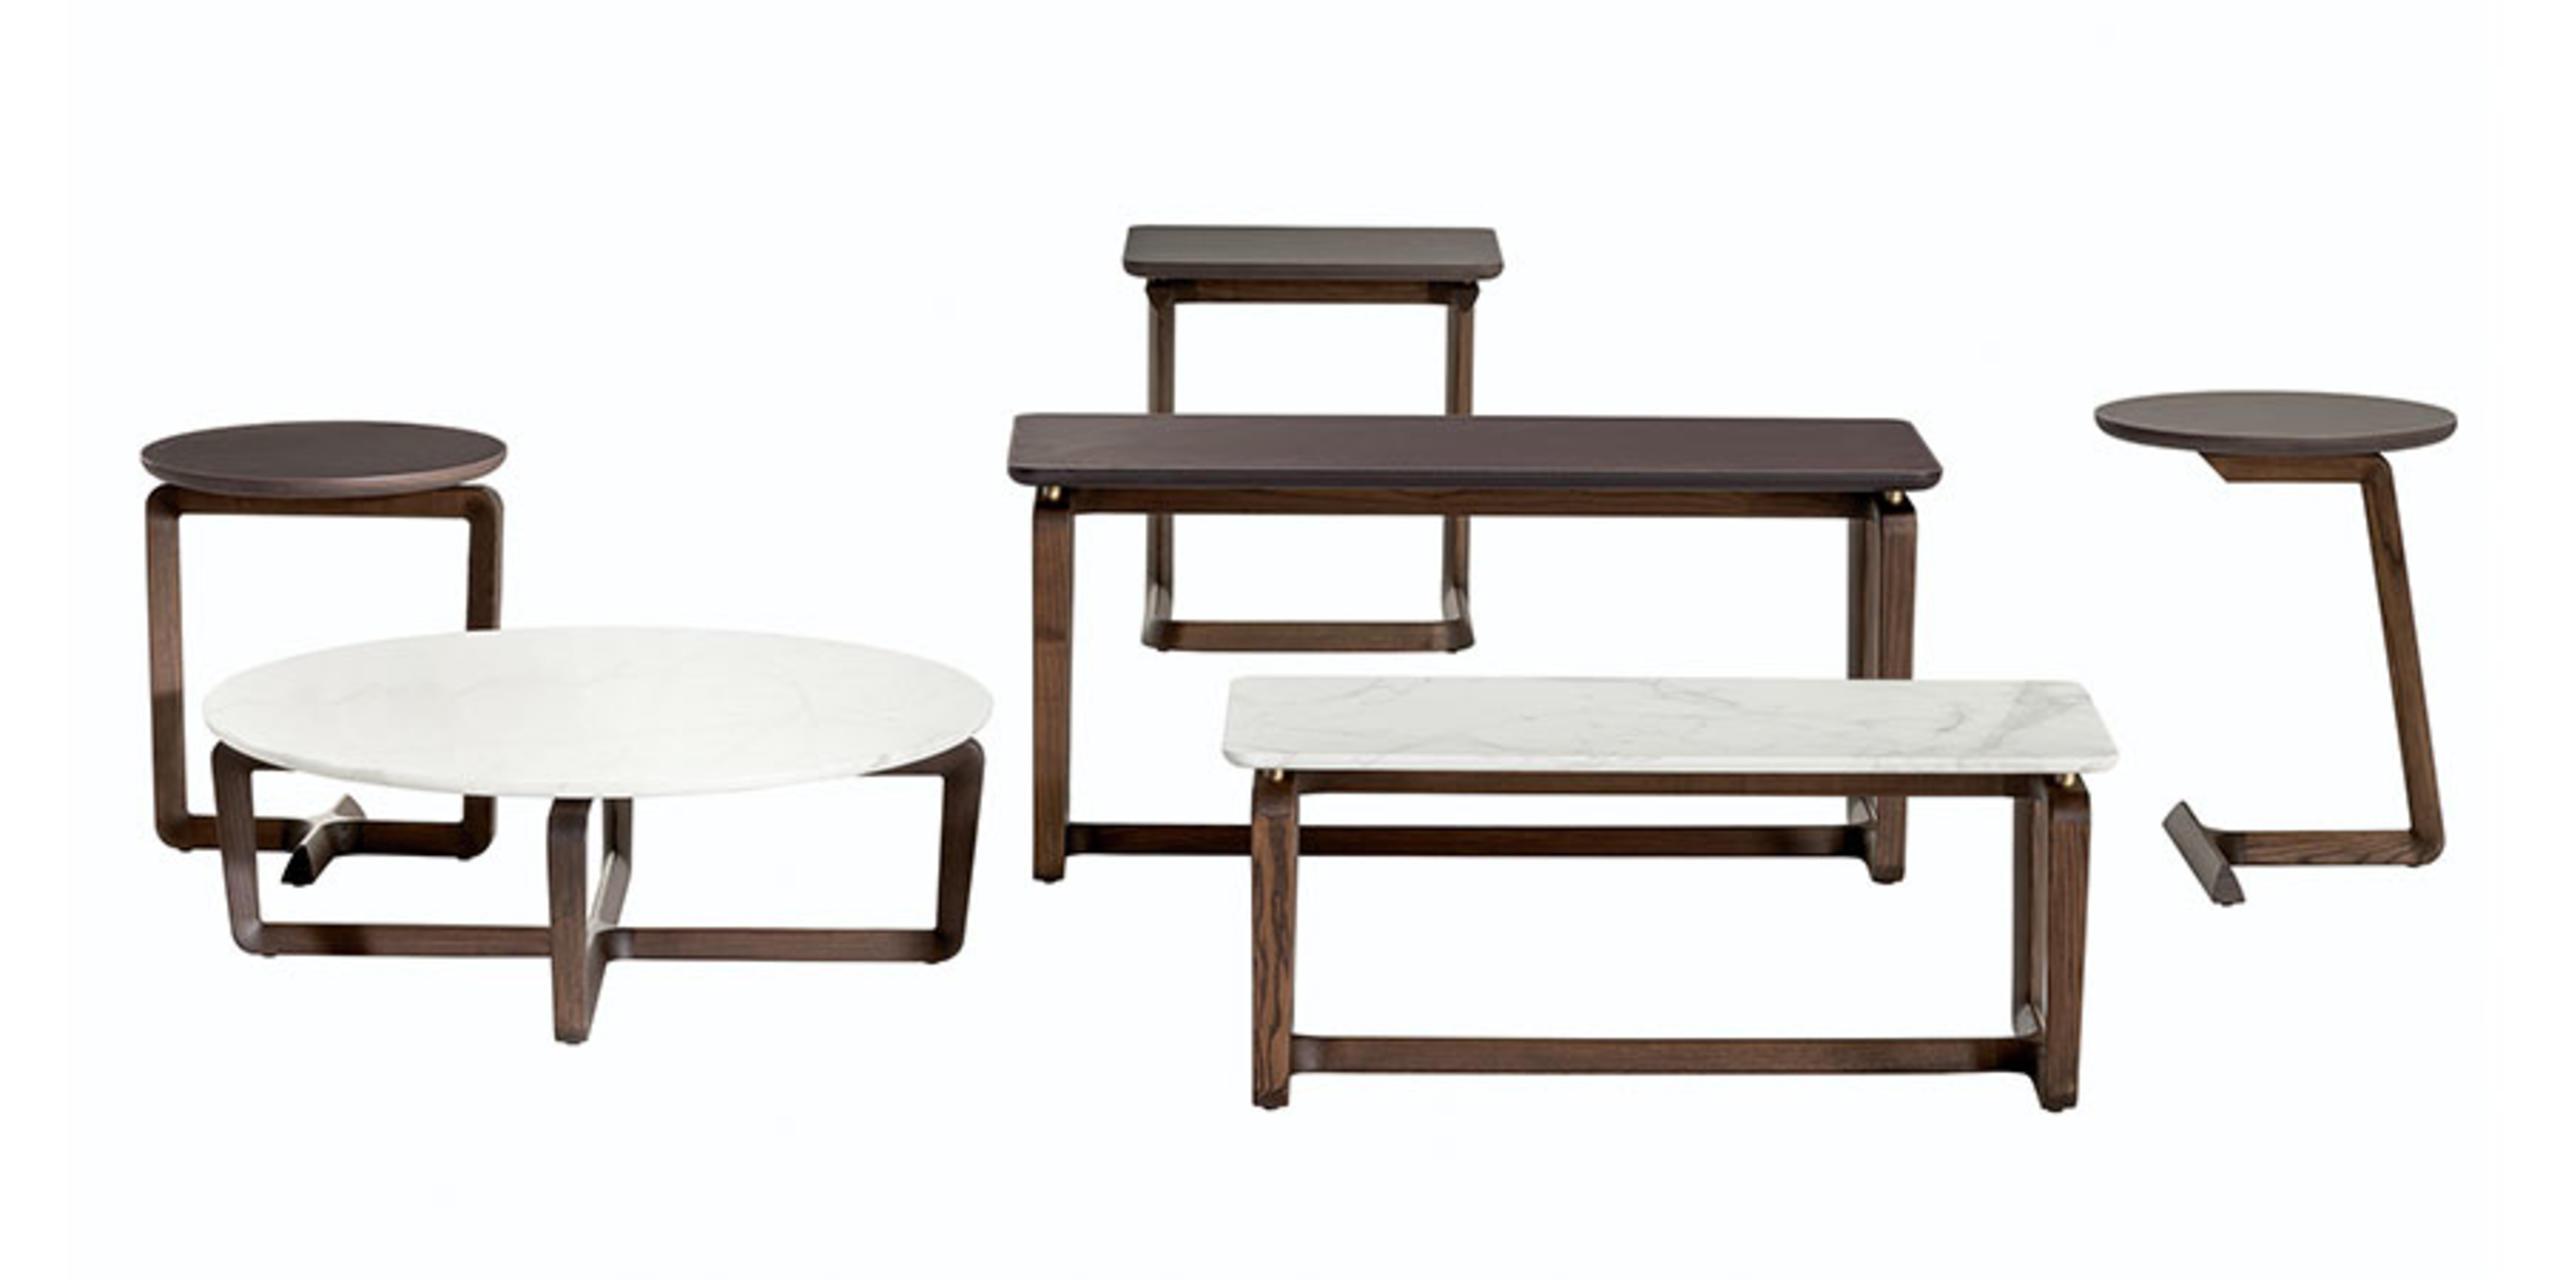 2560x1280 Modern House Design Unique Furniture Catalogue Poltrona Frau